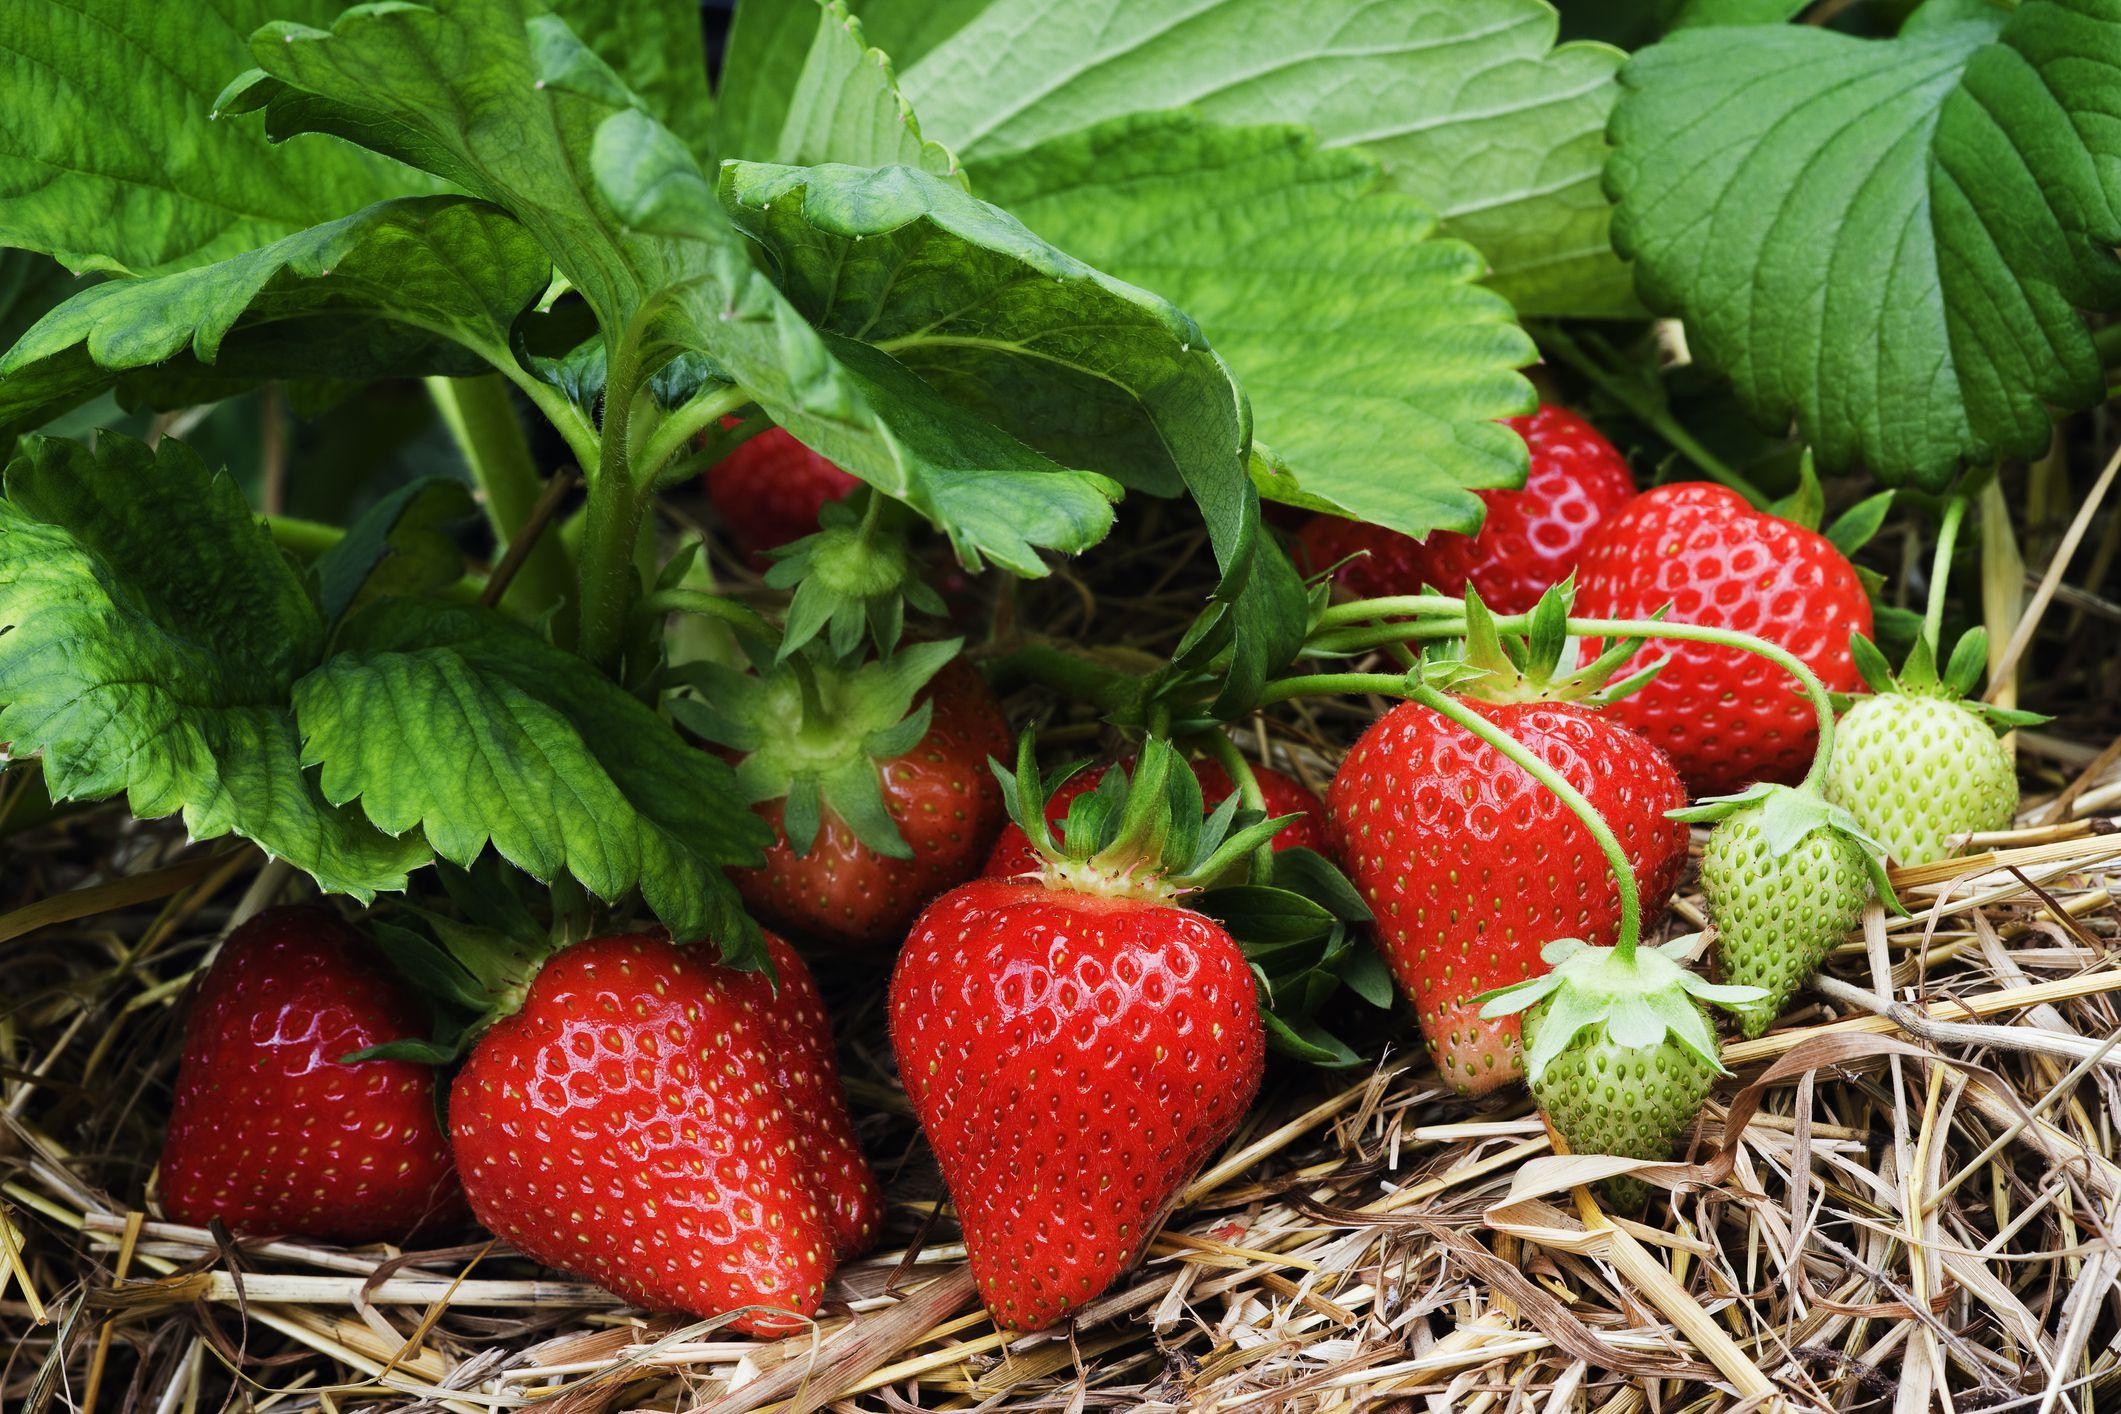 Strawberry plant photo